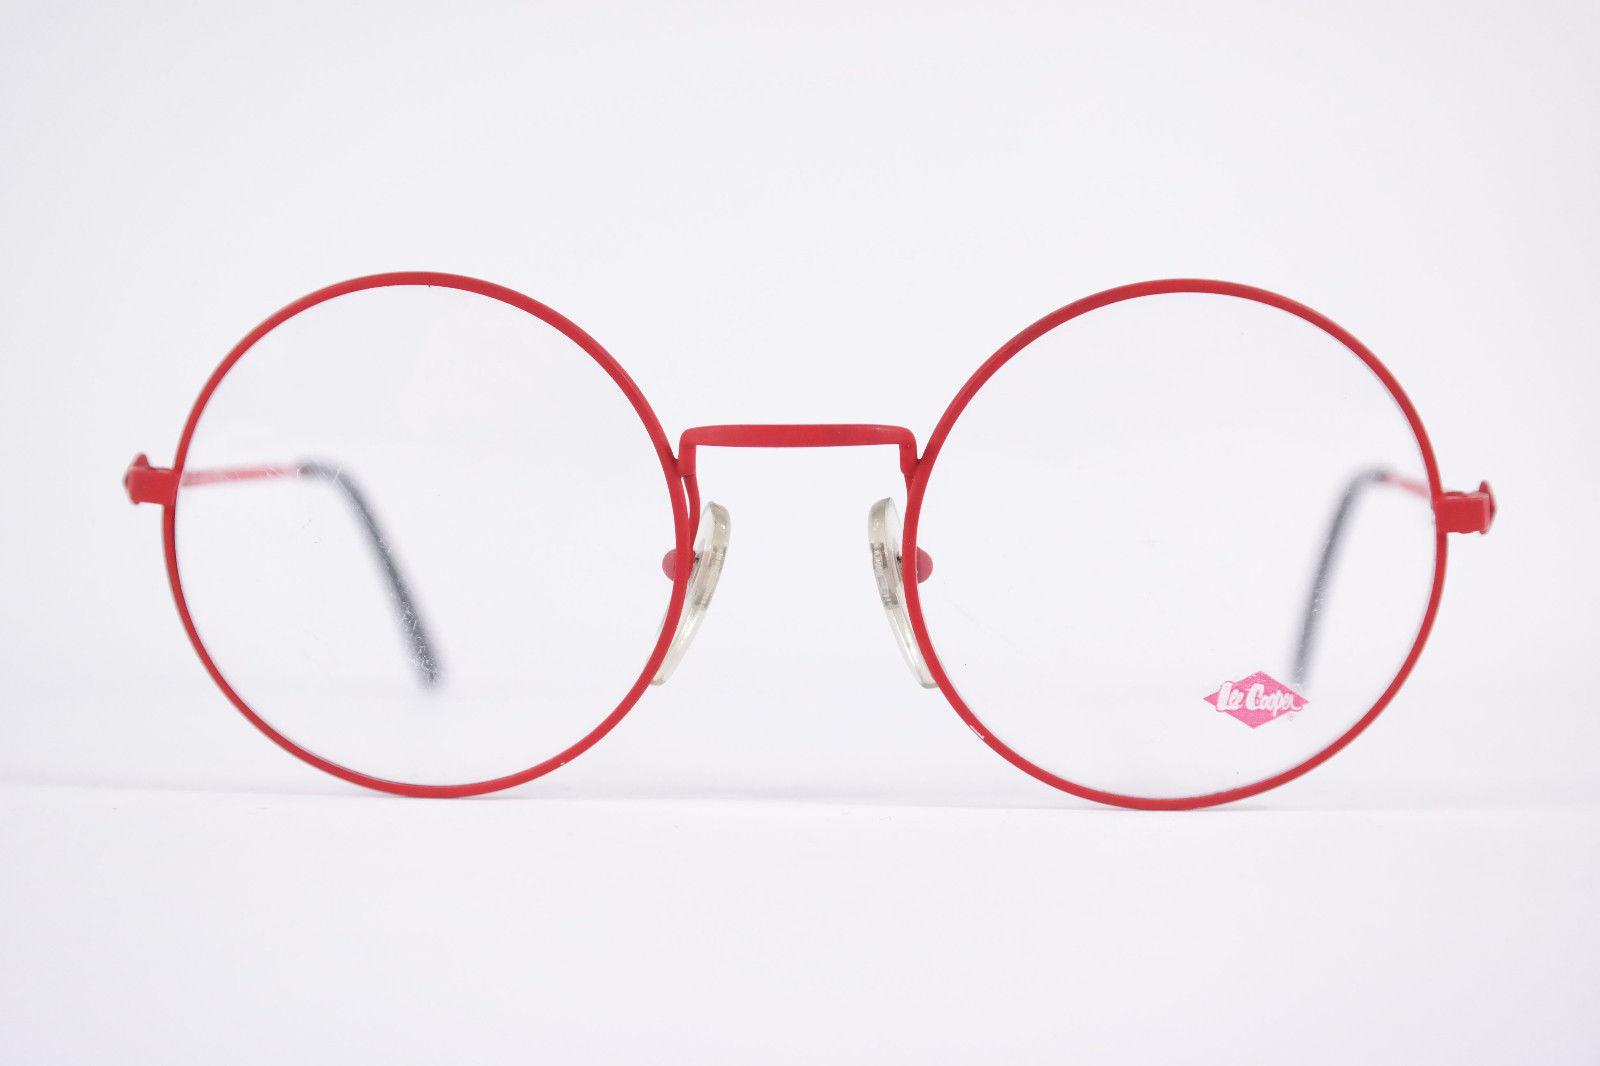 Authentic Lee Cooper Dallas Red Black Round Eyeglasses France Eyewear Unisex